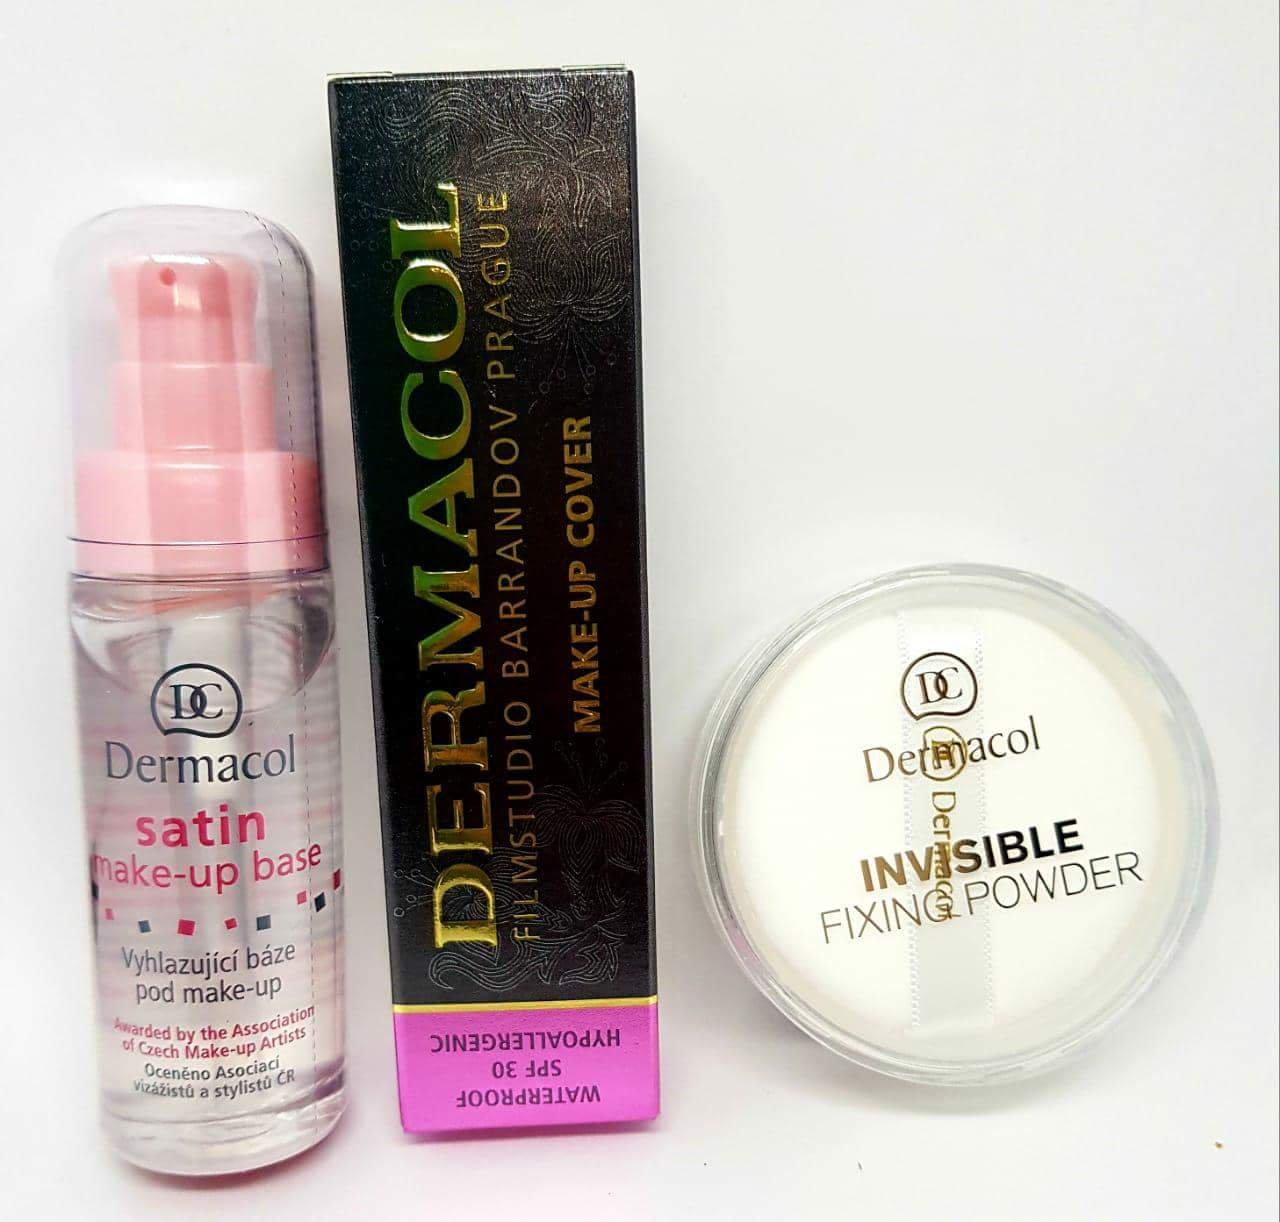 KIT Dermacol Make-up Cover foundation + Primer Satin make up base 30ml + Invisible Fixing Powder White BUNDLE (SHADE 211) 3 items FULL SIZE DERMACOL 100% ORIGINAL Guarantee